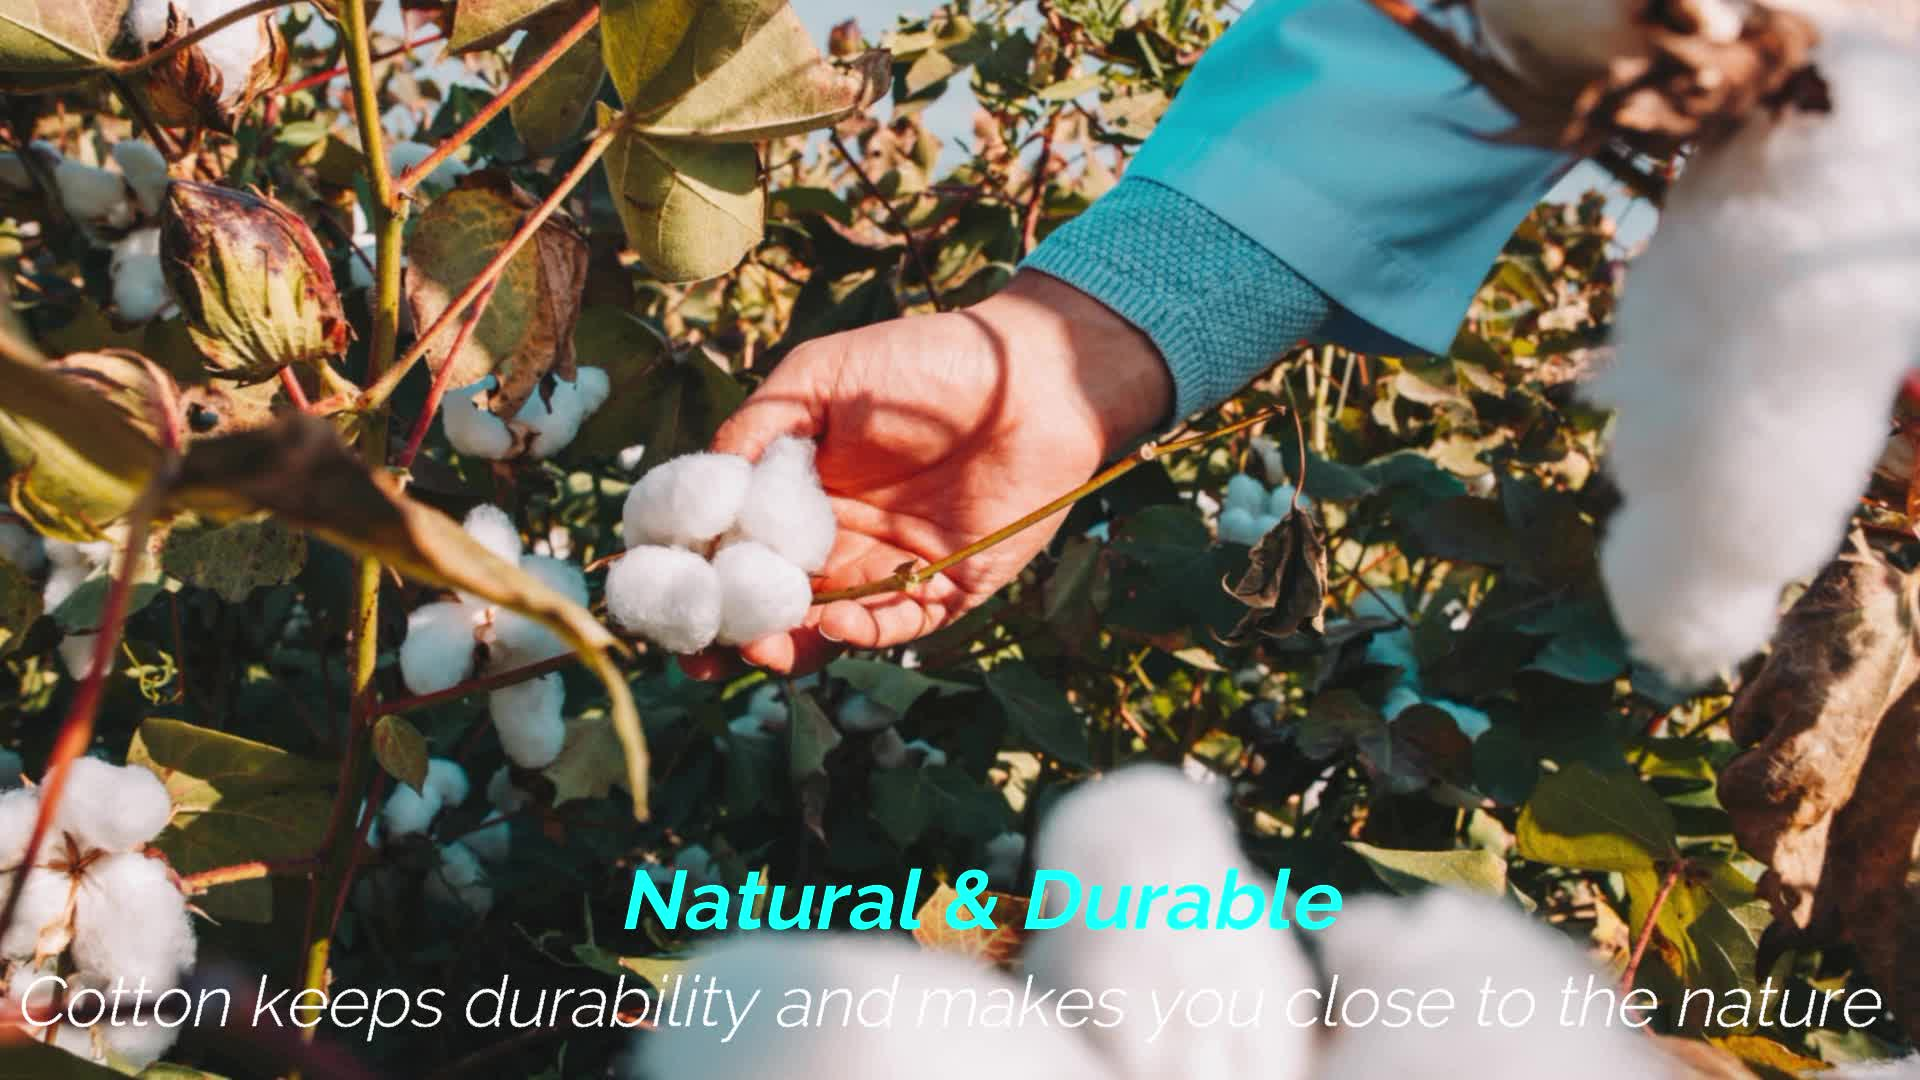 Hot Selling 2019 Super Soft Organic Cotton Muslin Bamboo Newborn Baby Swaddle Blanket Wrap Set